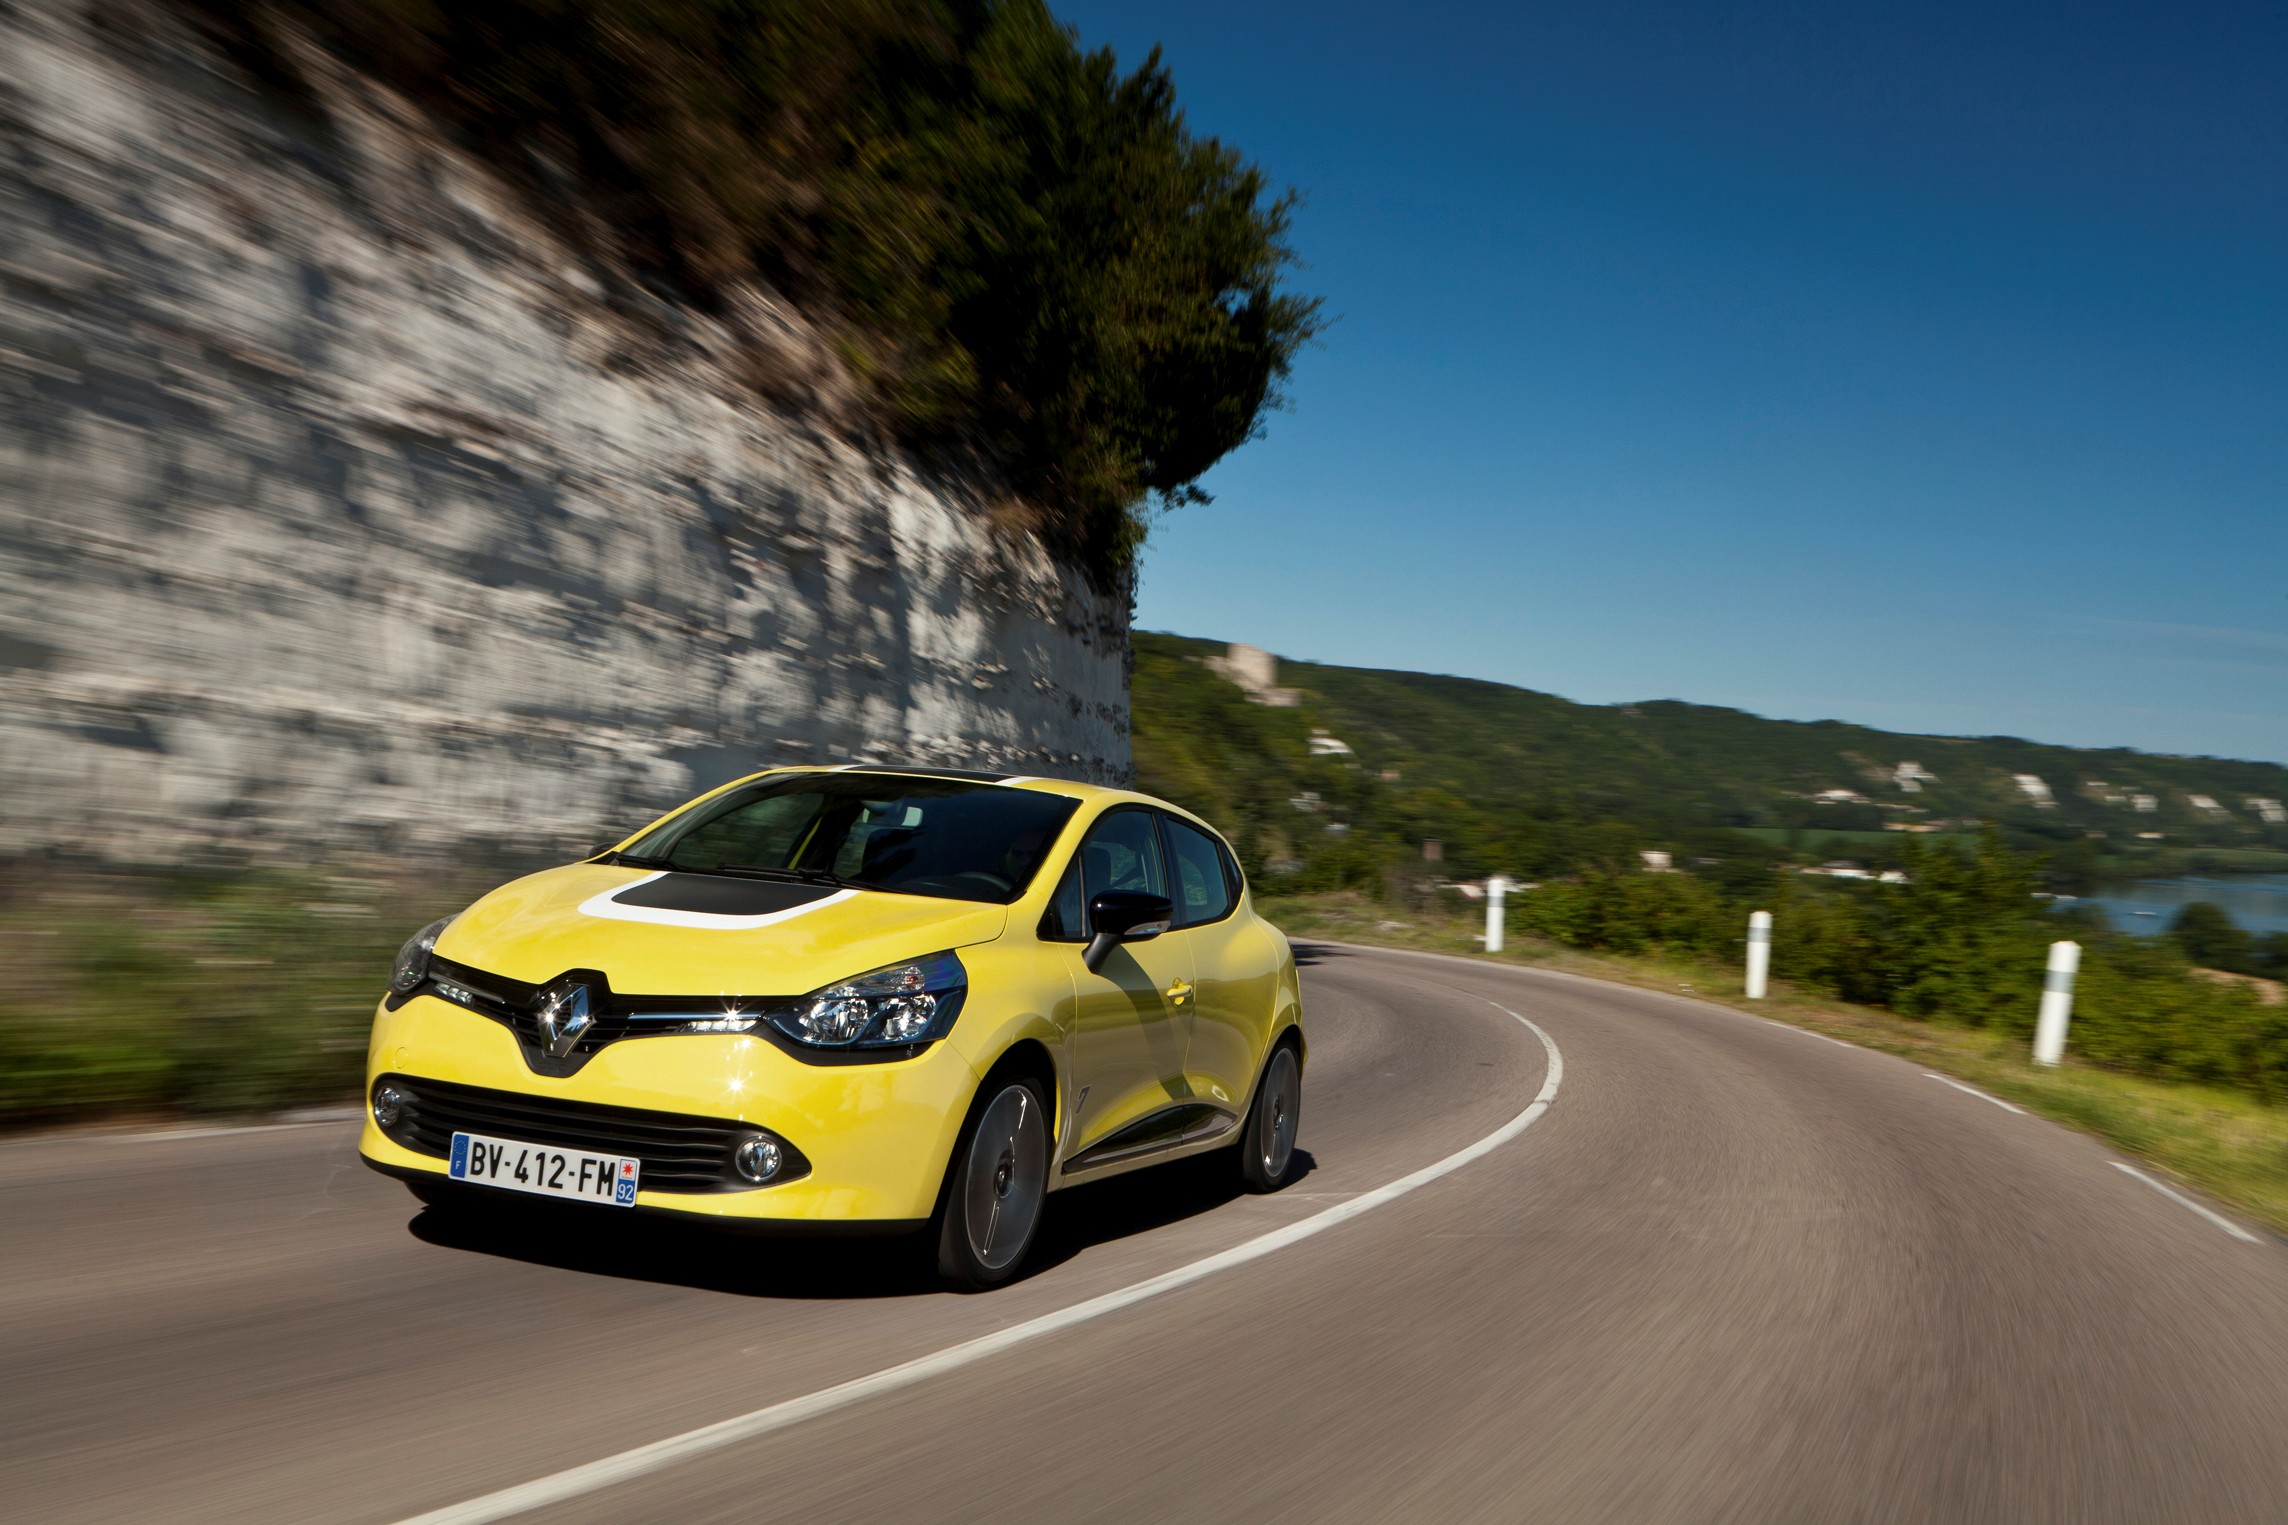 Renault Clio via Renault Presse – Credit: Denis MEUNIER